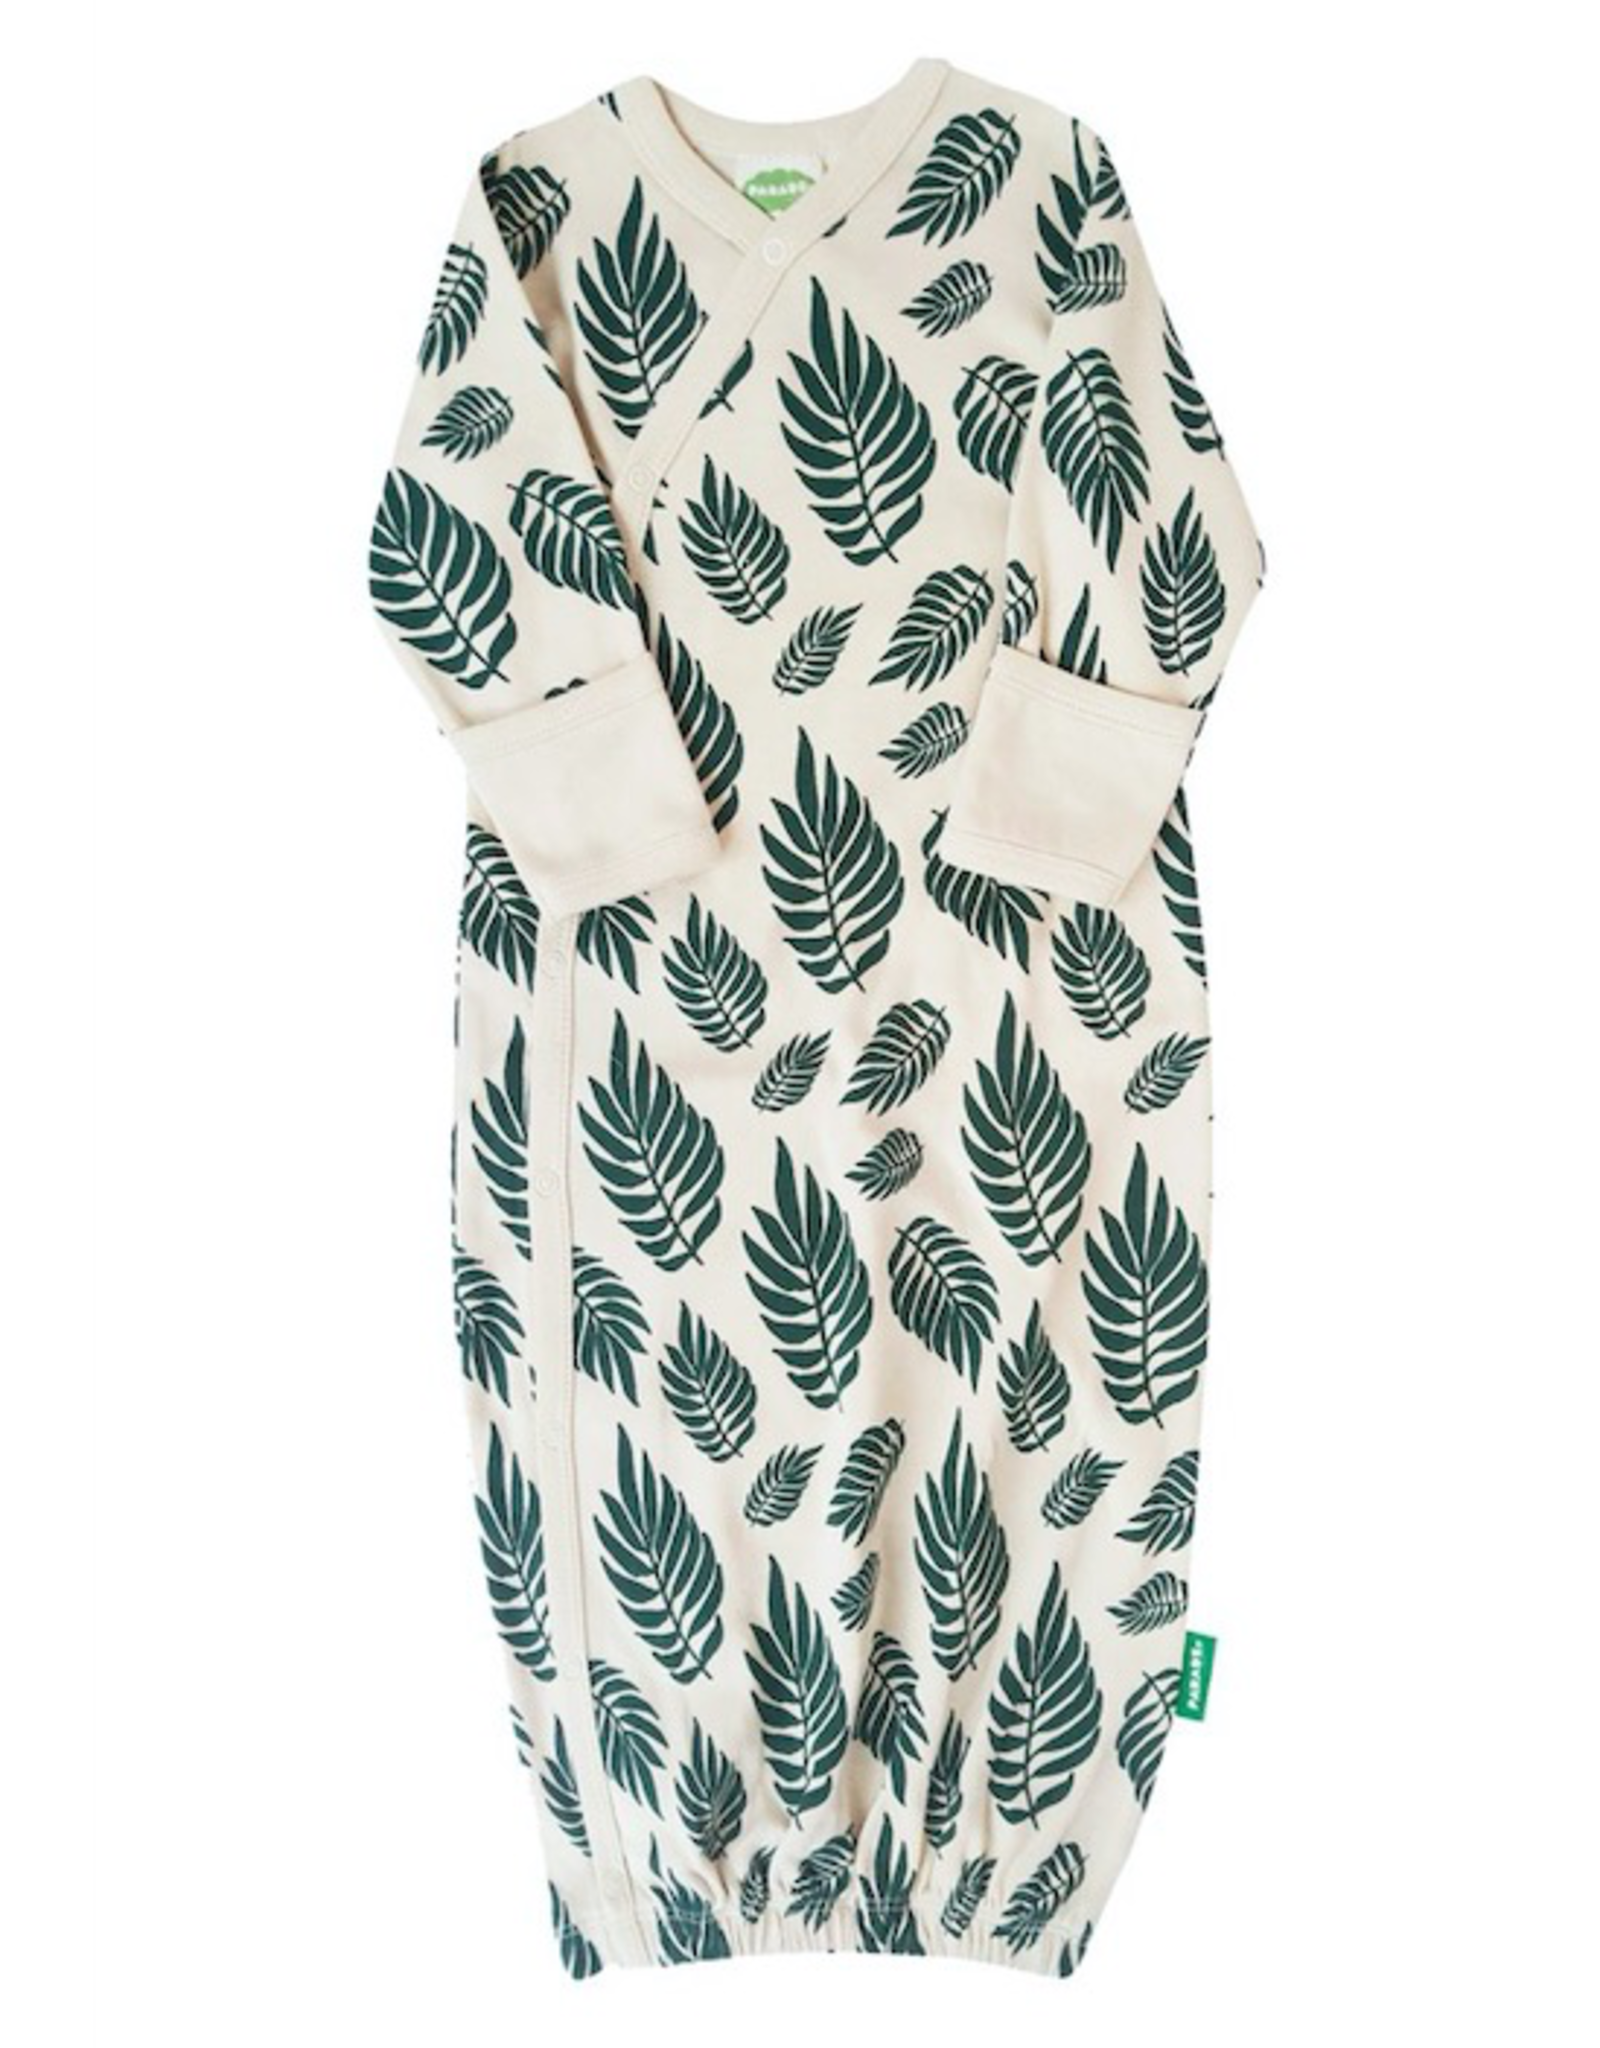 Parade Organics Kimono Gown - Signature Print